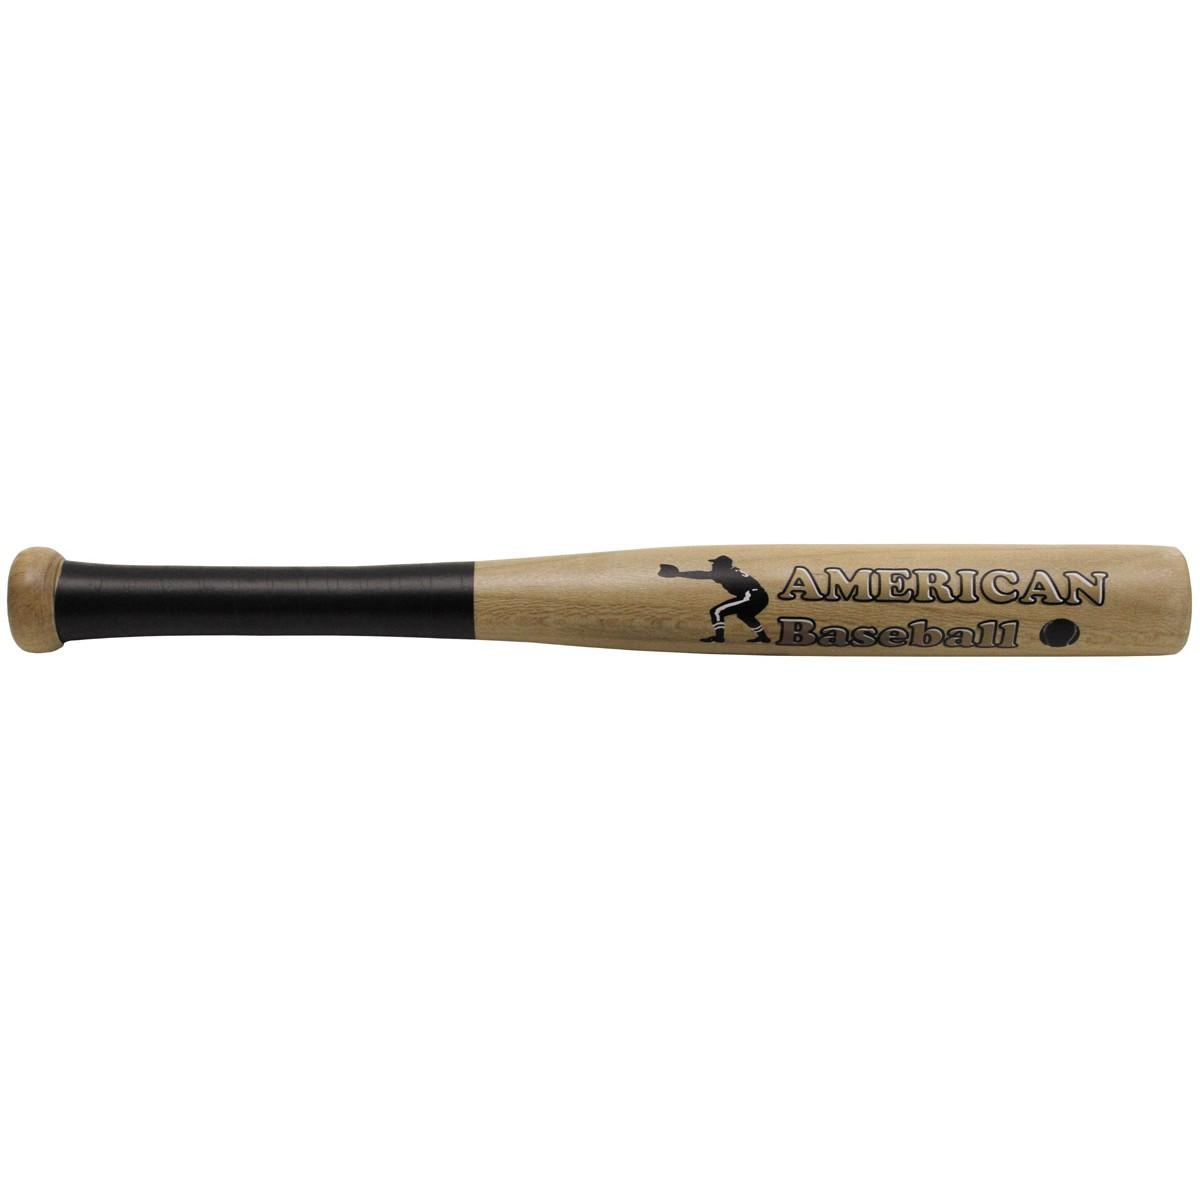 "Baseballschläger, Holz 18"", natur, ""American Baseball"""